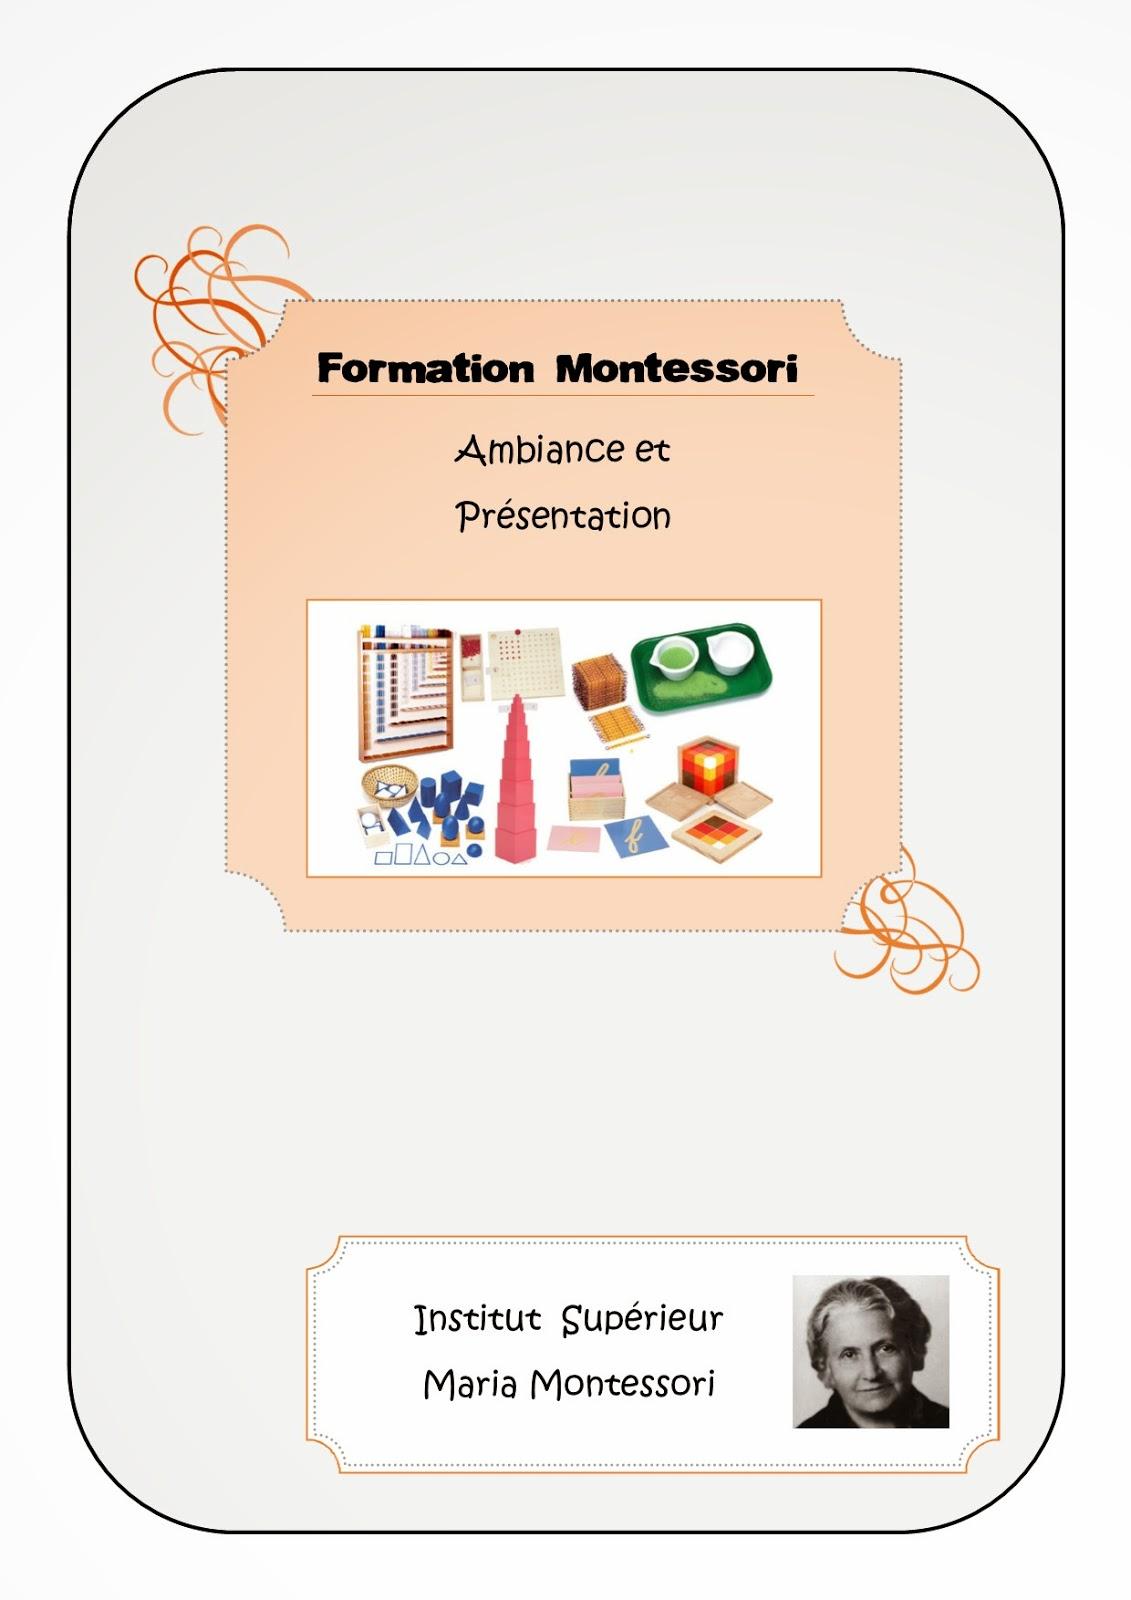 Compte-rendu formation Montessori